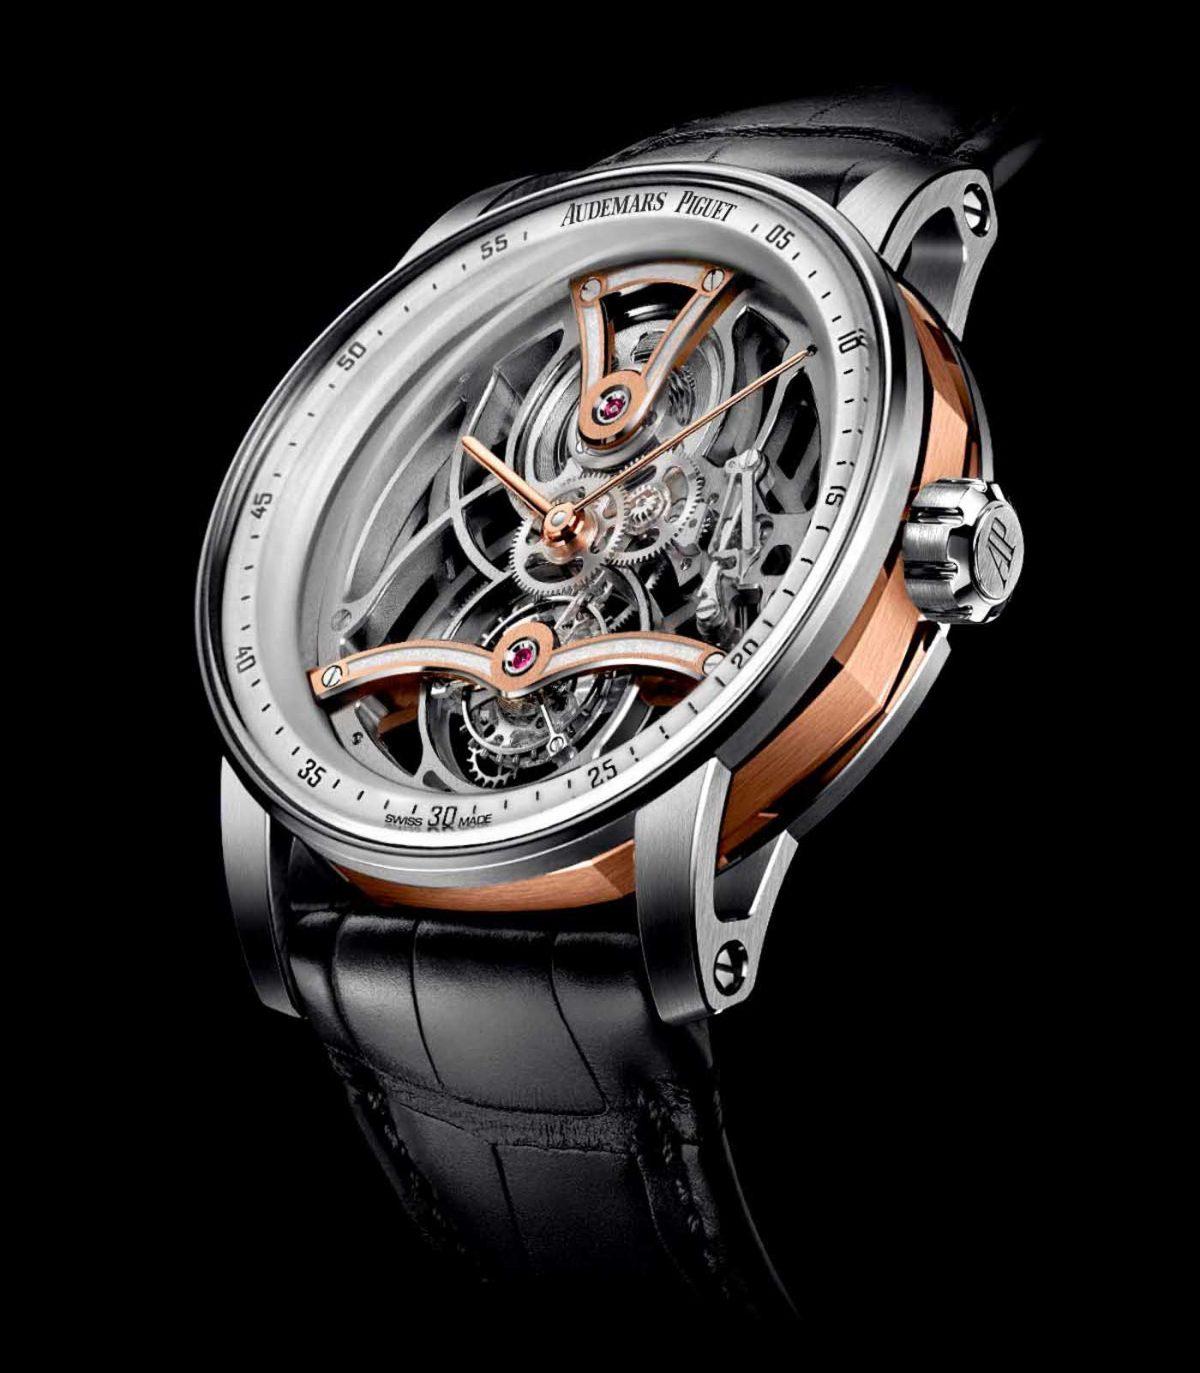 Luxury Replica Audemars Piguet Code 11.59 Tourbillon Openworked Only Watch Edition